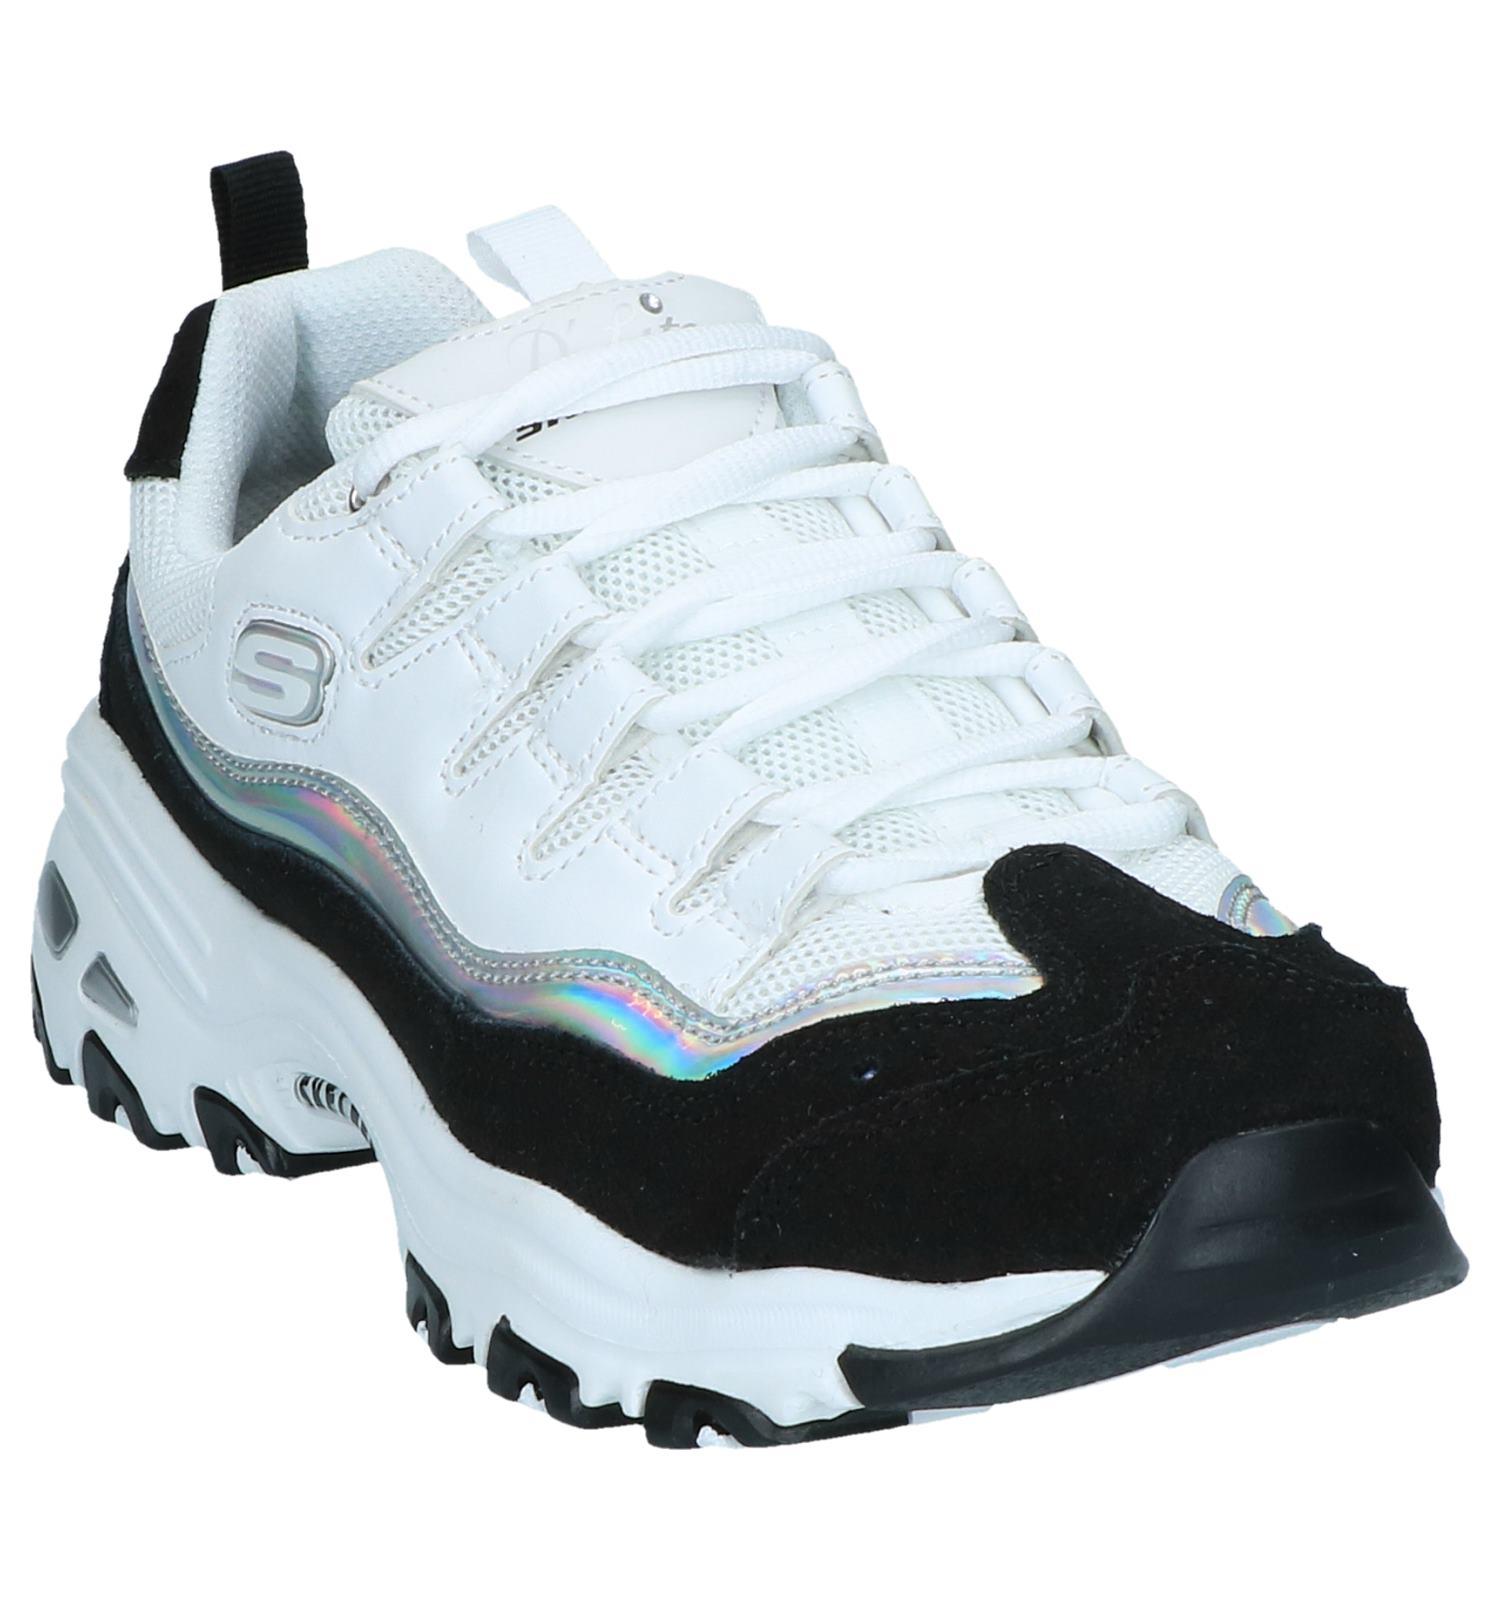 Witte Sneakers Skechers D'Lites Grand View | TORFS.BE